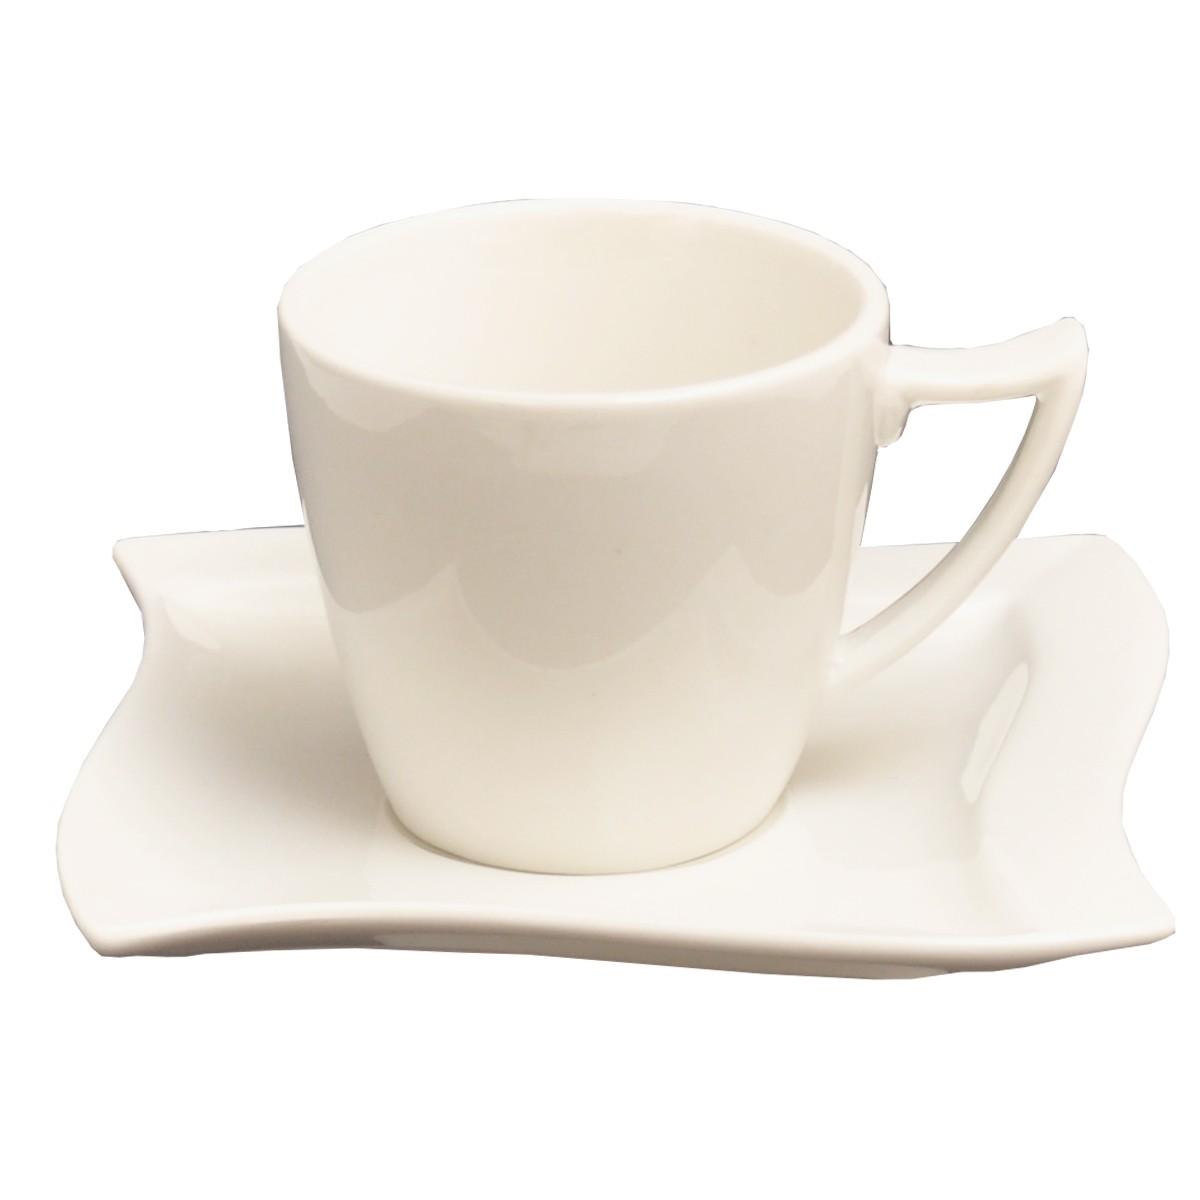 kaffeeservice emotion 36tlg f r 12 personen porzellan kaffeeservice ohne dekor. Black Bedroom Furniture Sets. Home Design Ideas